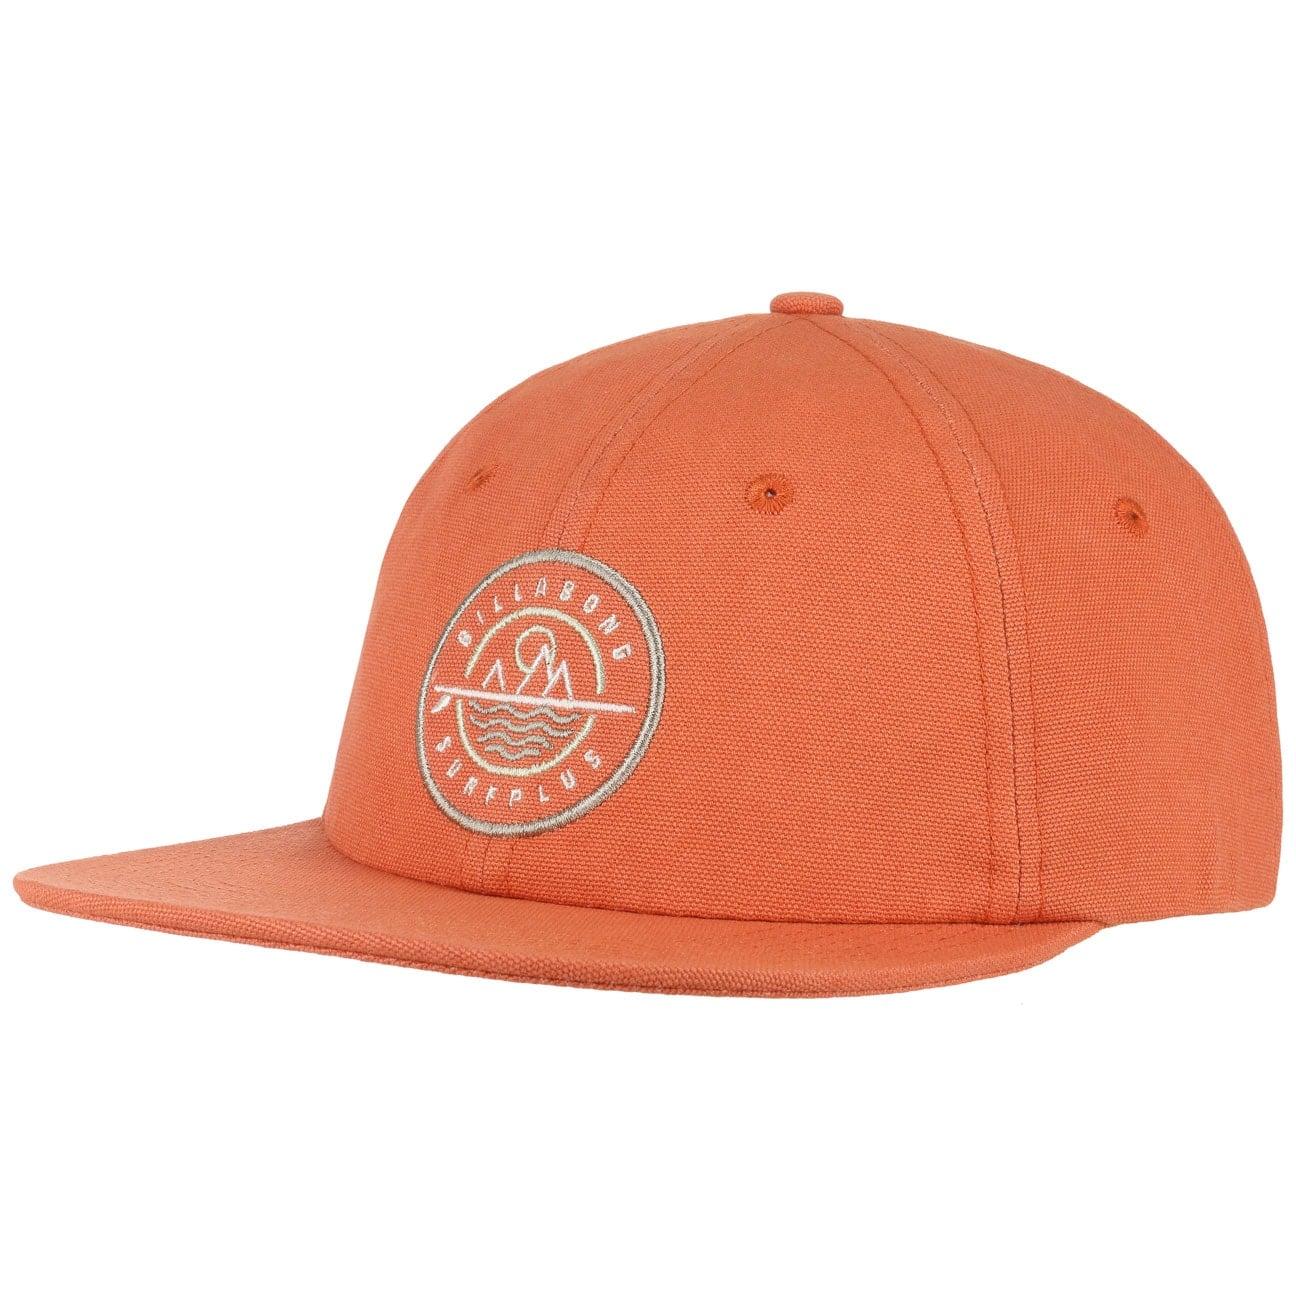 Casquette Snapback Crossboard by Billabong  baseball cap